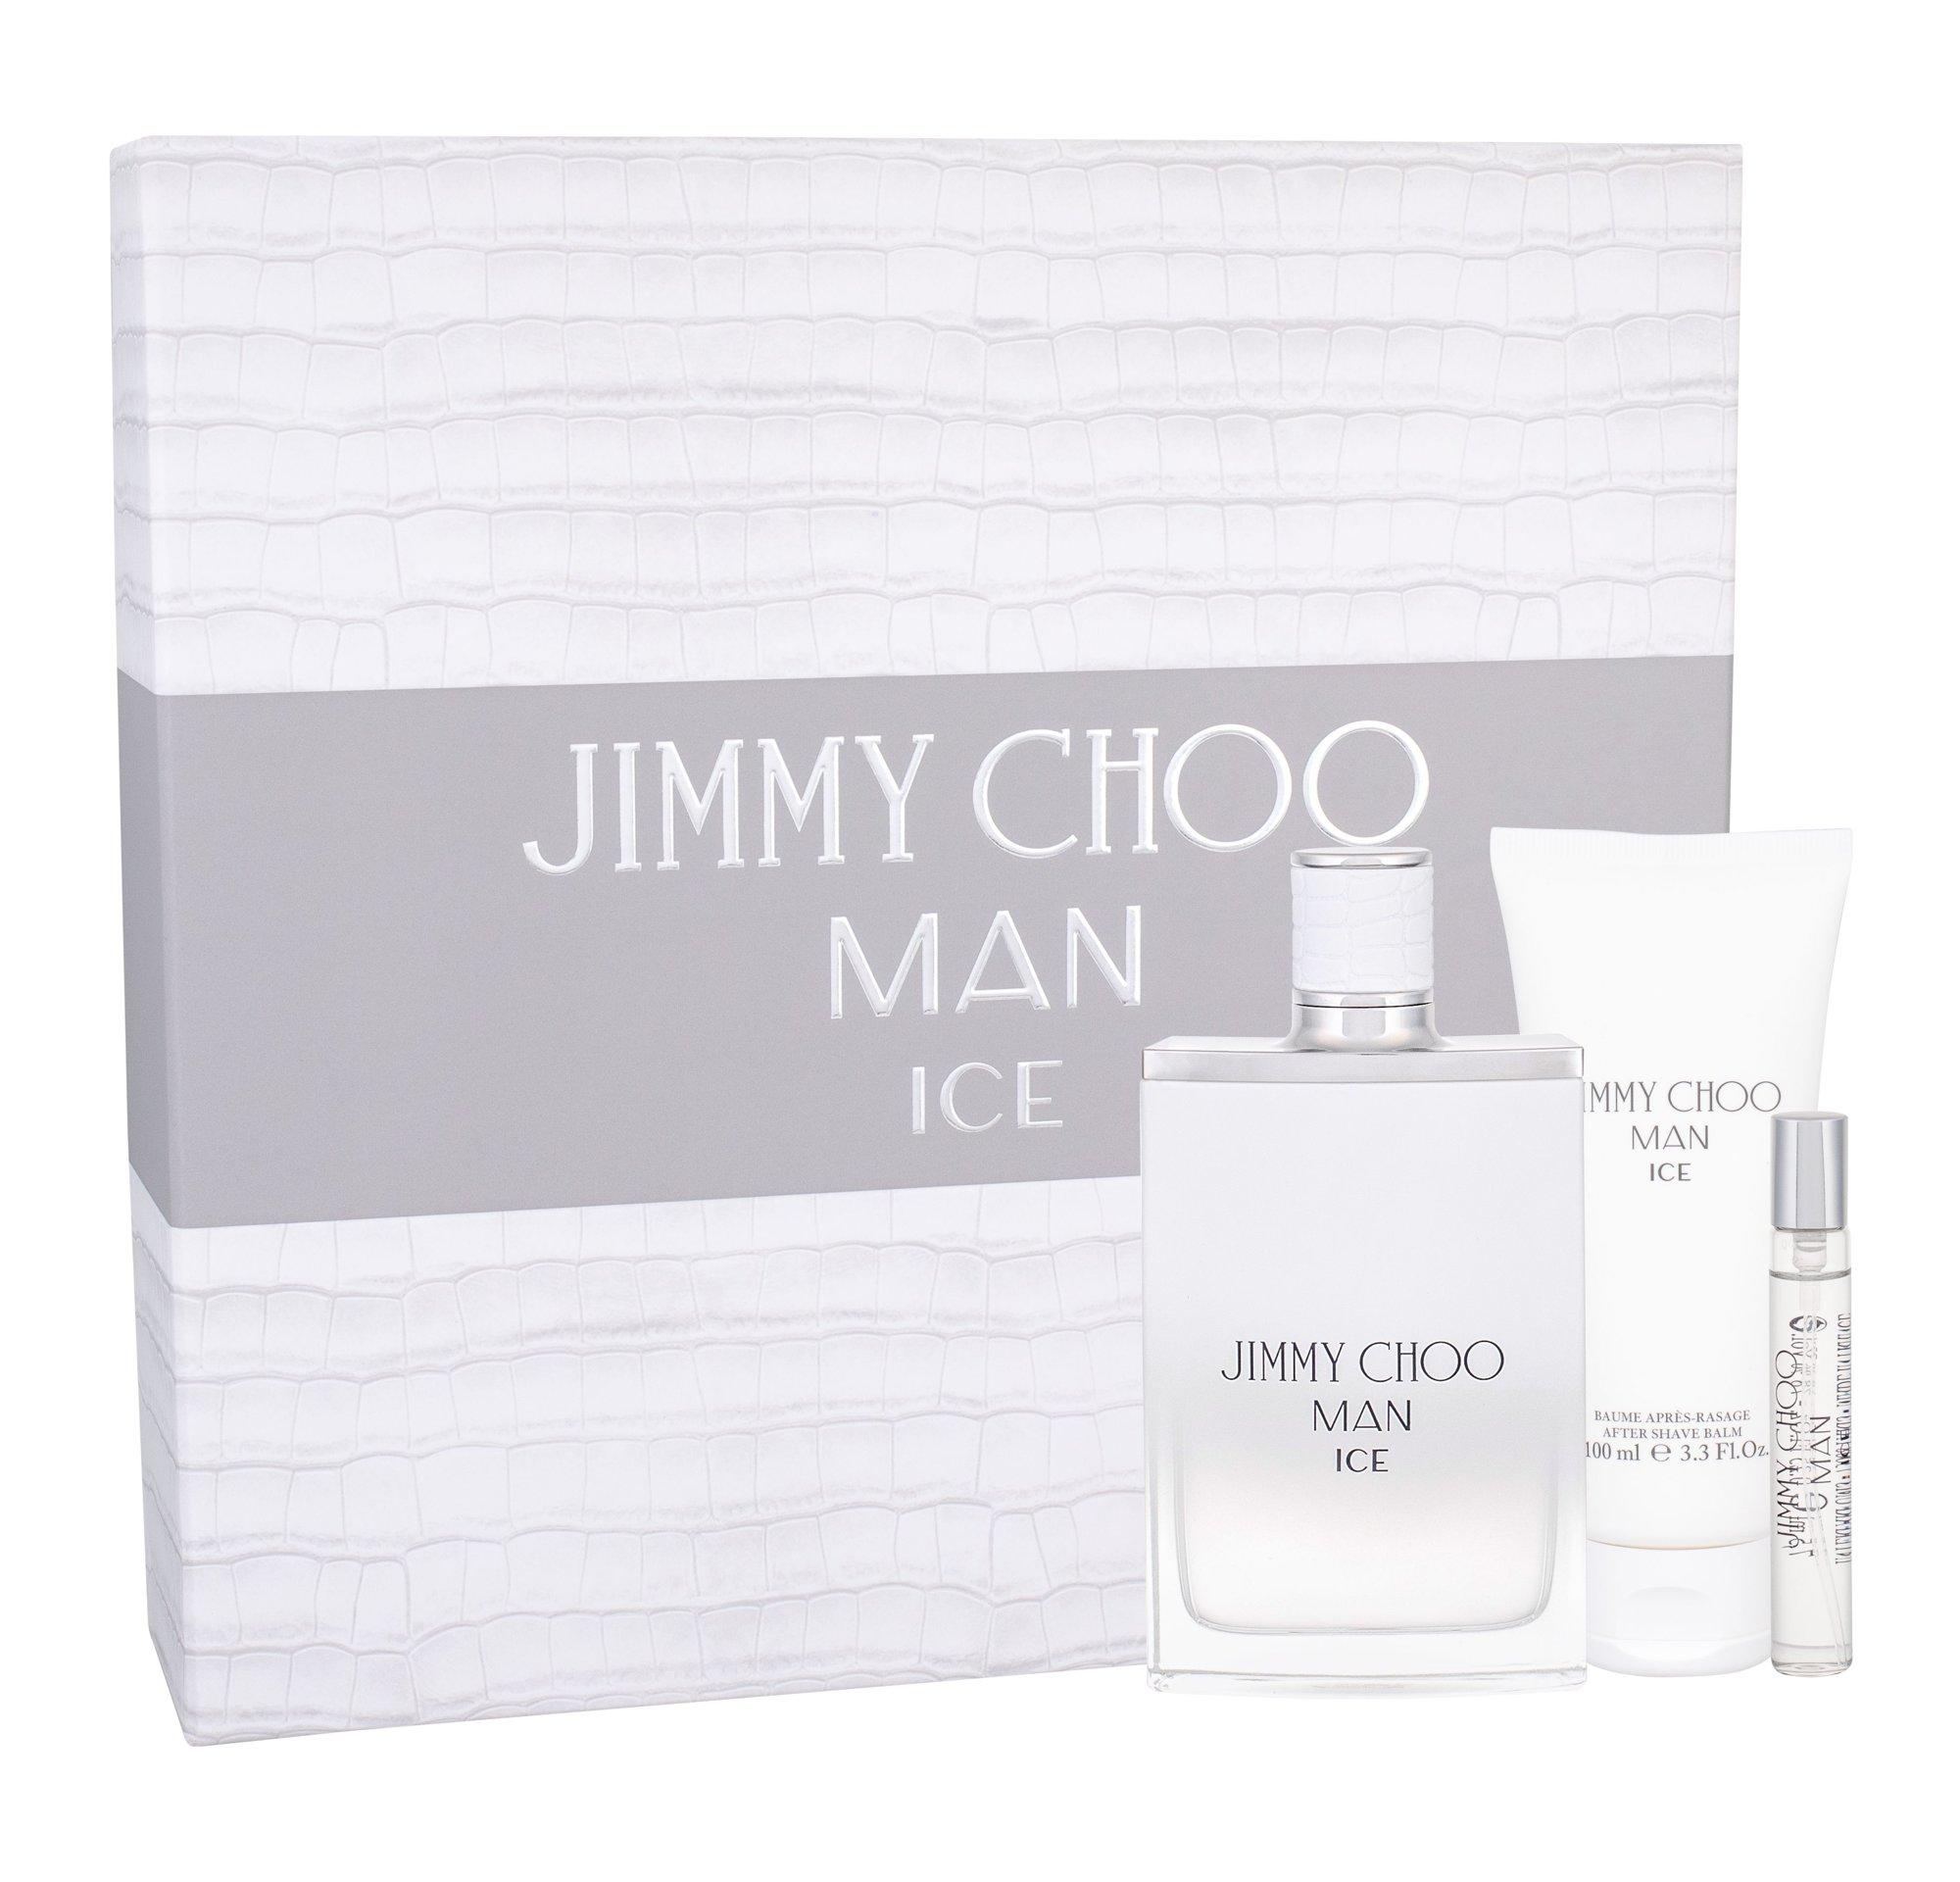 Jimmy Choo Jimmy Choo Man Ice, toaletná voda 100 ml + balzam po holení 100 ml + toaletná voda 7,5 ml